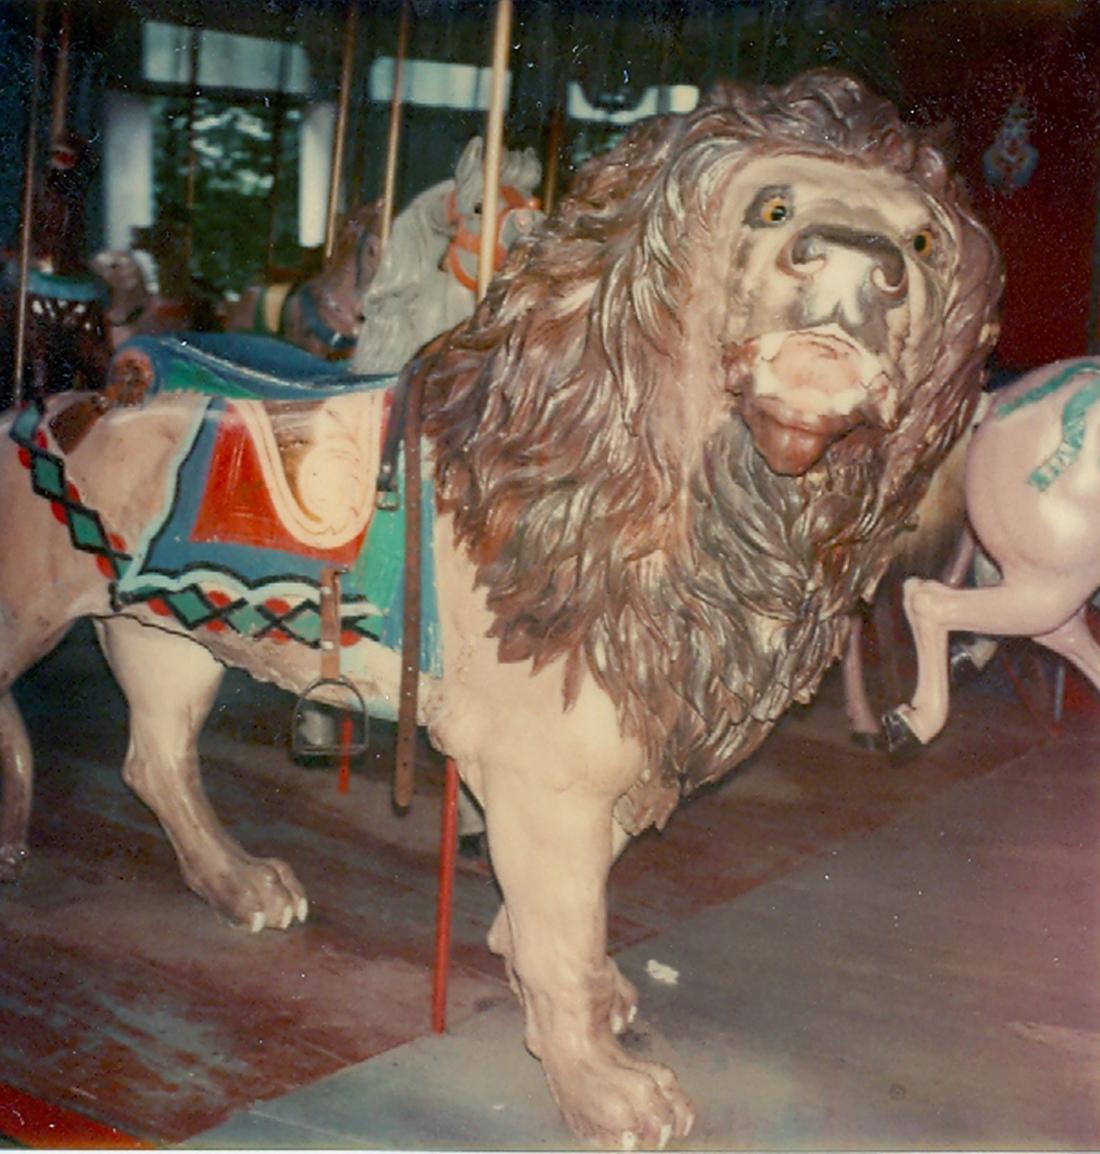 Salem-Willows-MA-ca-1905-Looff-carousel-lion-100